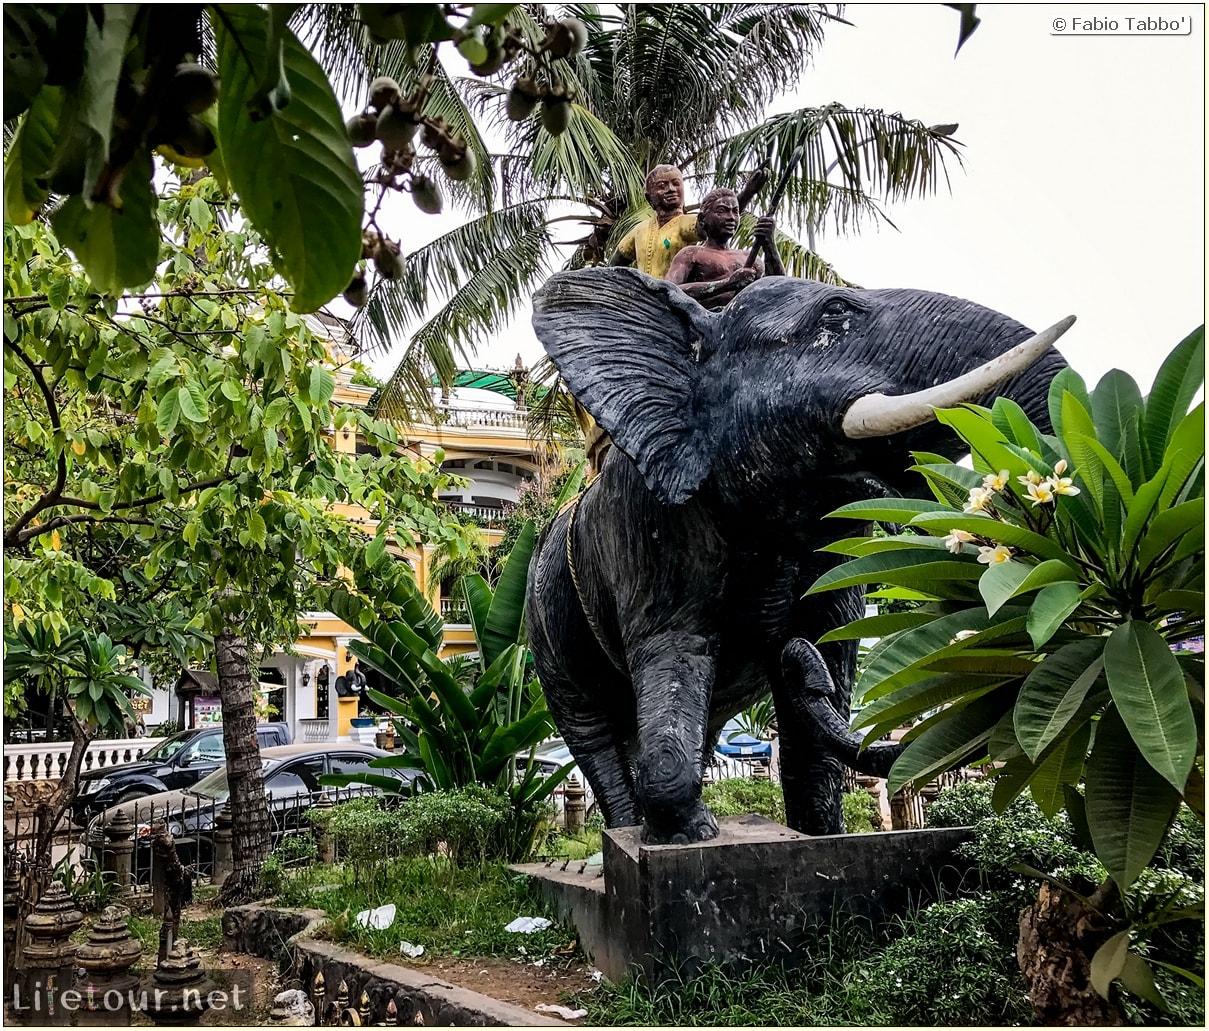 Fabio_s-LifeTour---Cambodia-(2017-July-August)---Siem-Reap-(Angkor)---Restaurants---Terrasse-des-Elephants---18473-cover